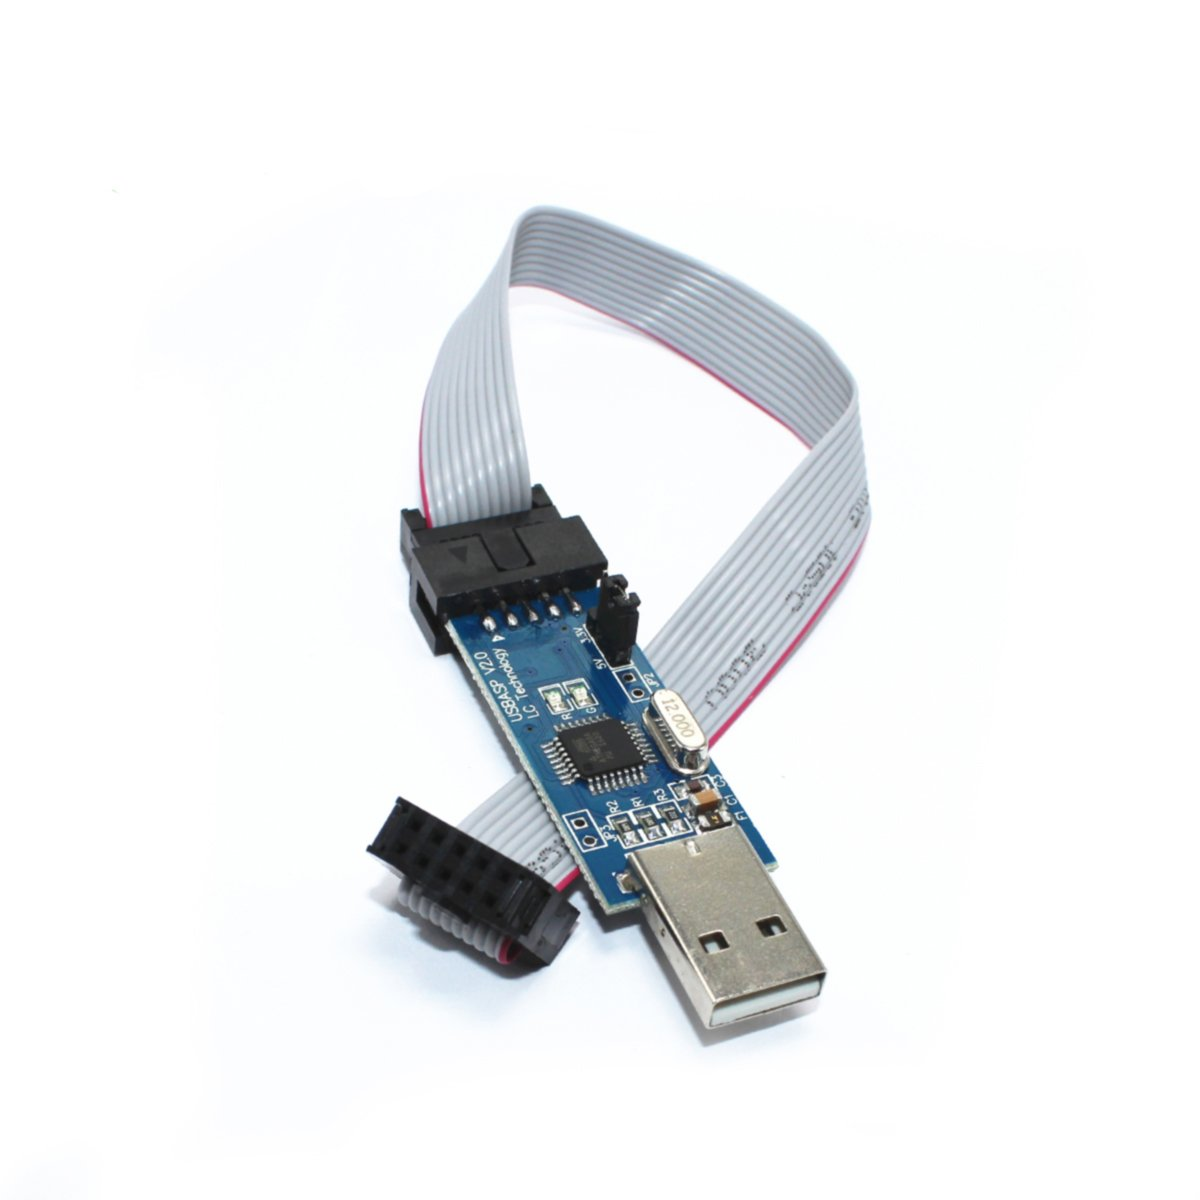 Hiletgo 51 Avr Atmega8 Programmer Usbasp Usb Isp 10 Pin Download Image Pc Android Iphone And Ipad 33v 5v